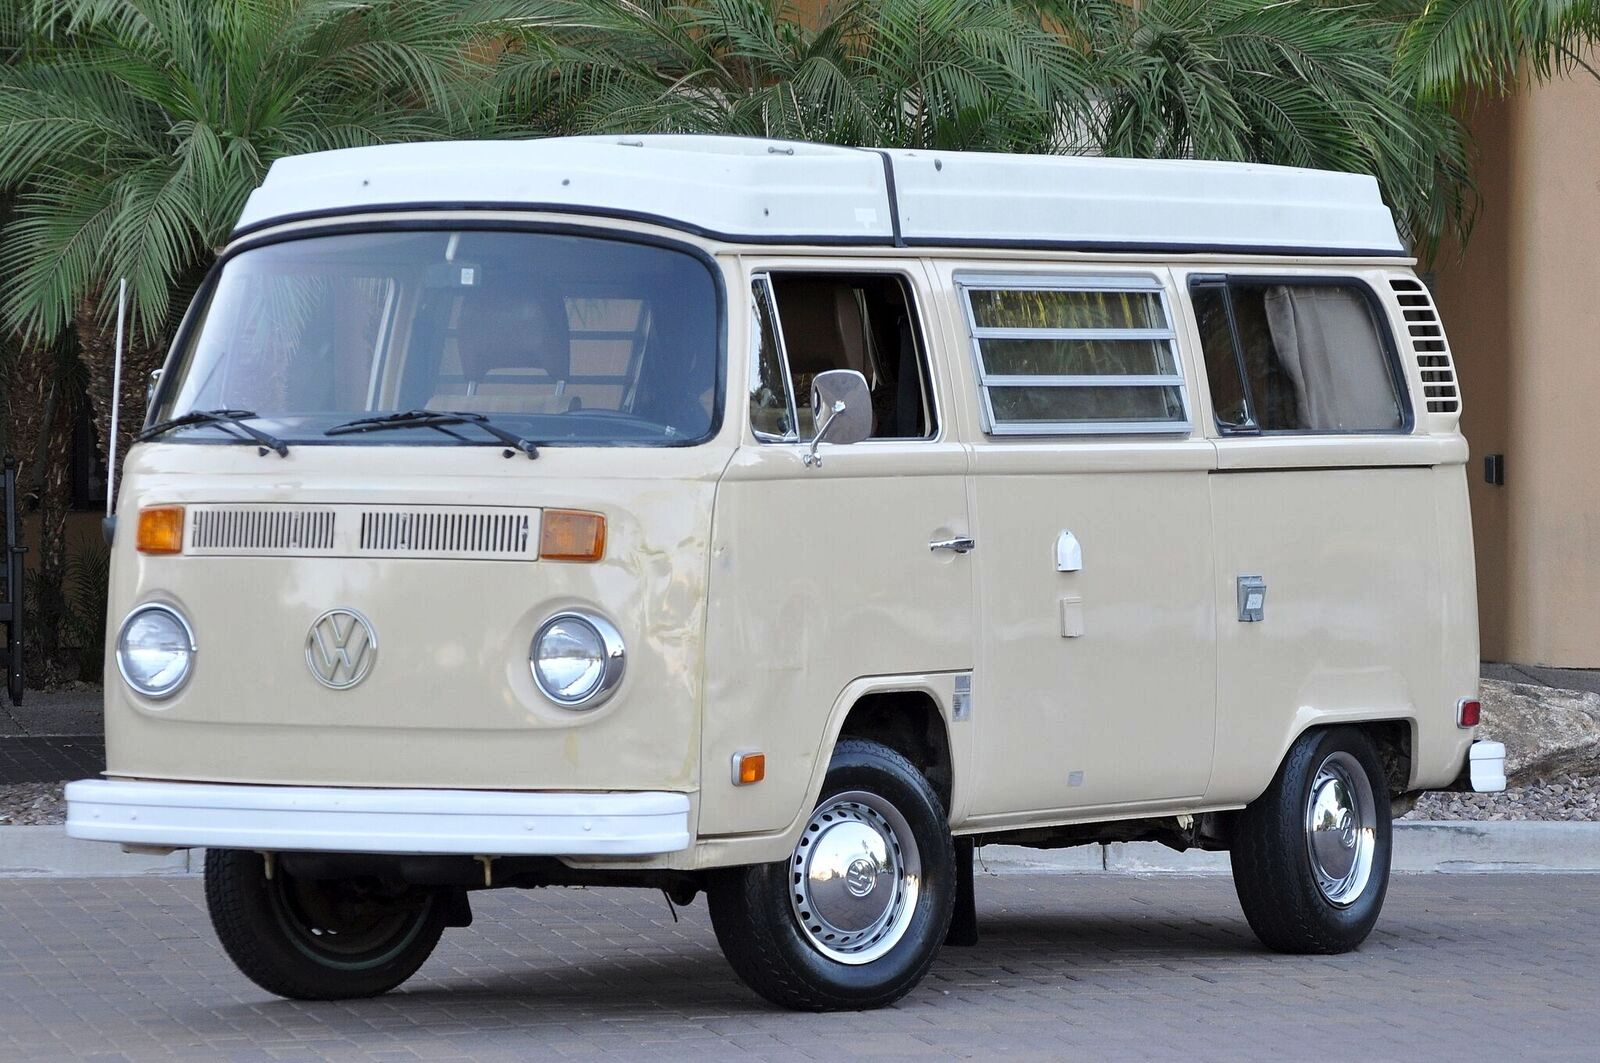 1978 volkswagen t2 bus westfalia classicon motorwagen media gmbh. Black Bedroom Furniture Sets. Home Design Ideas